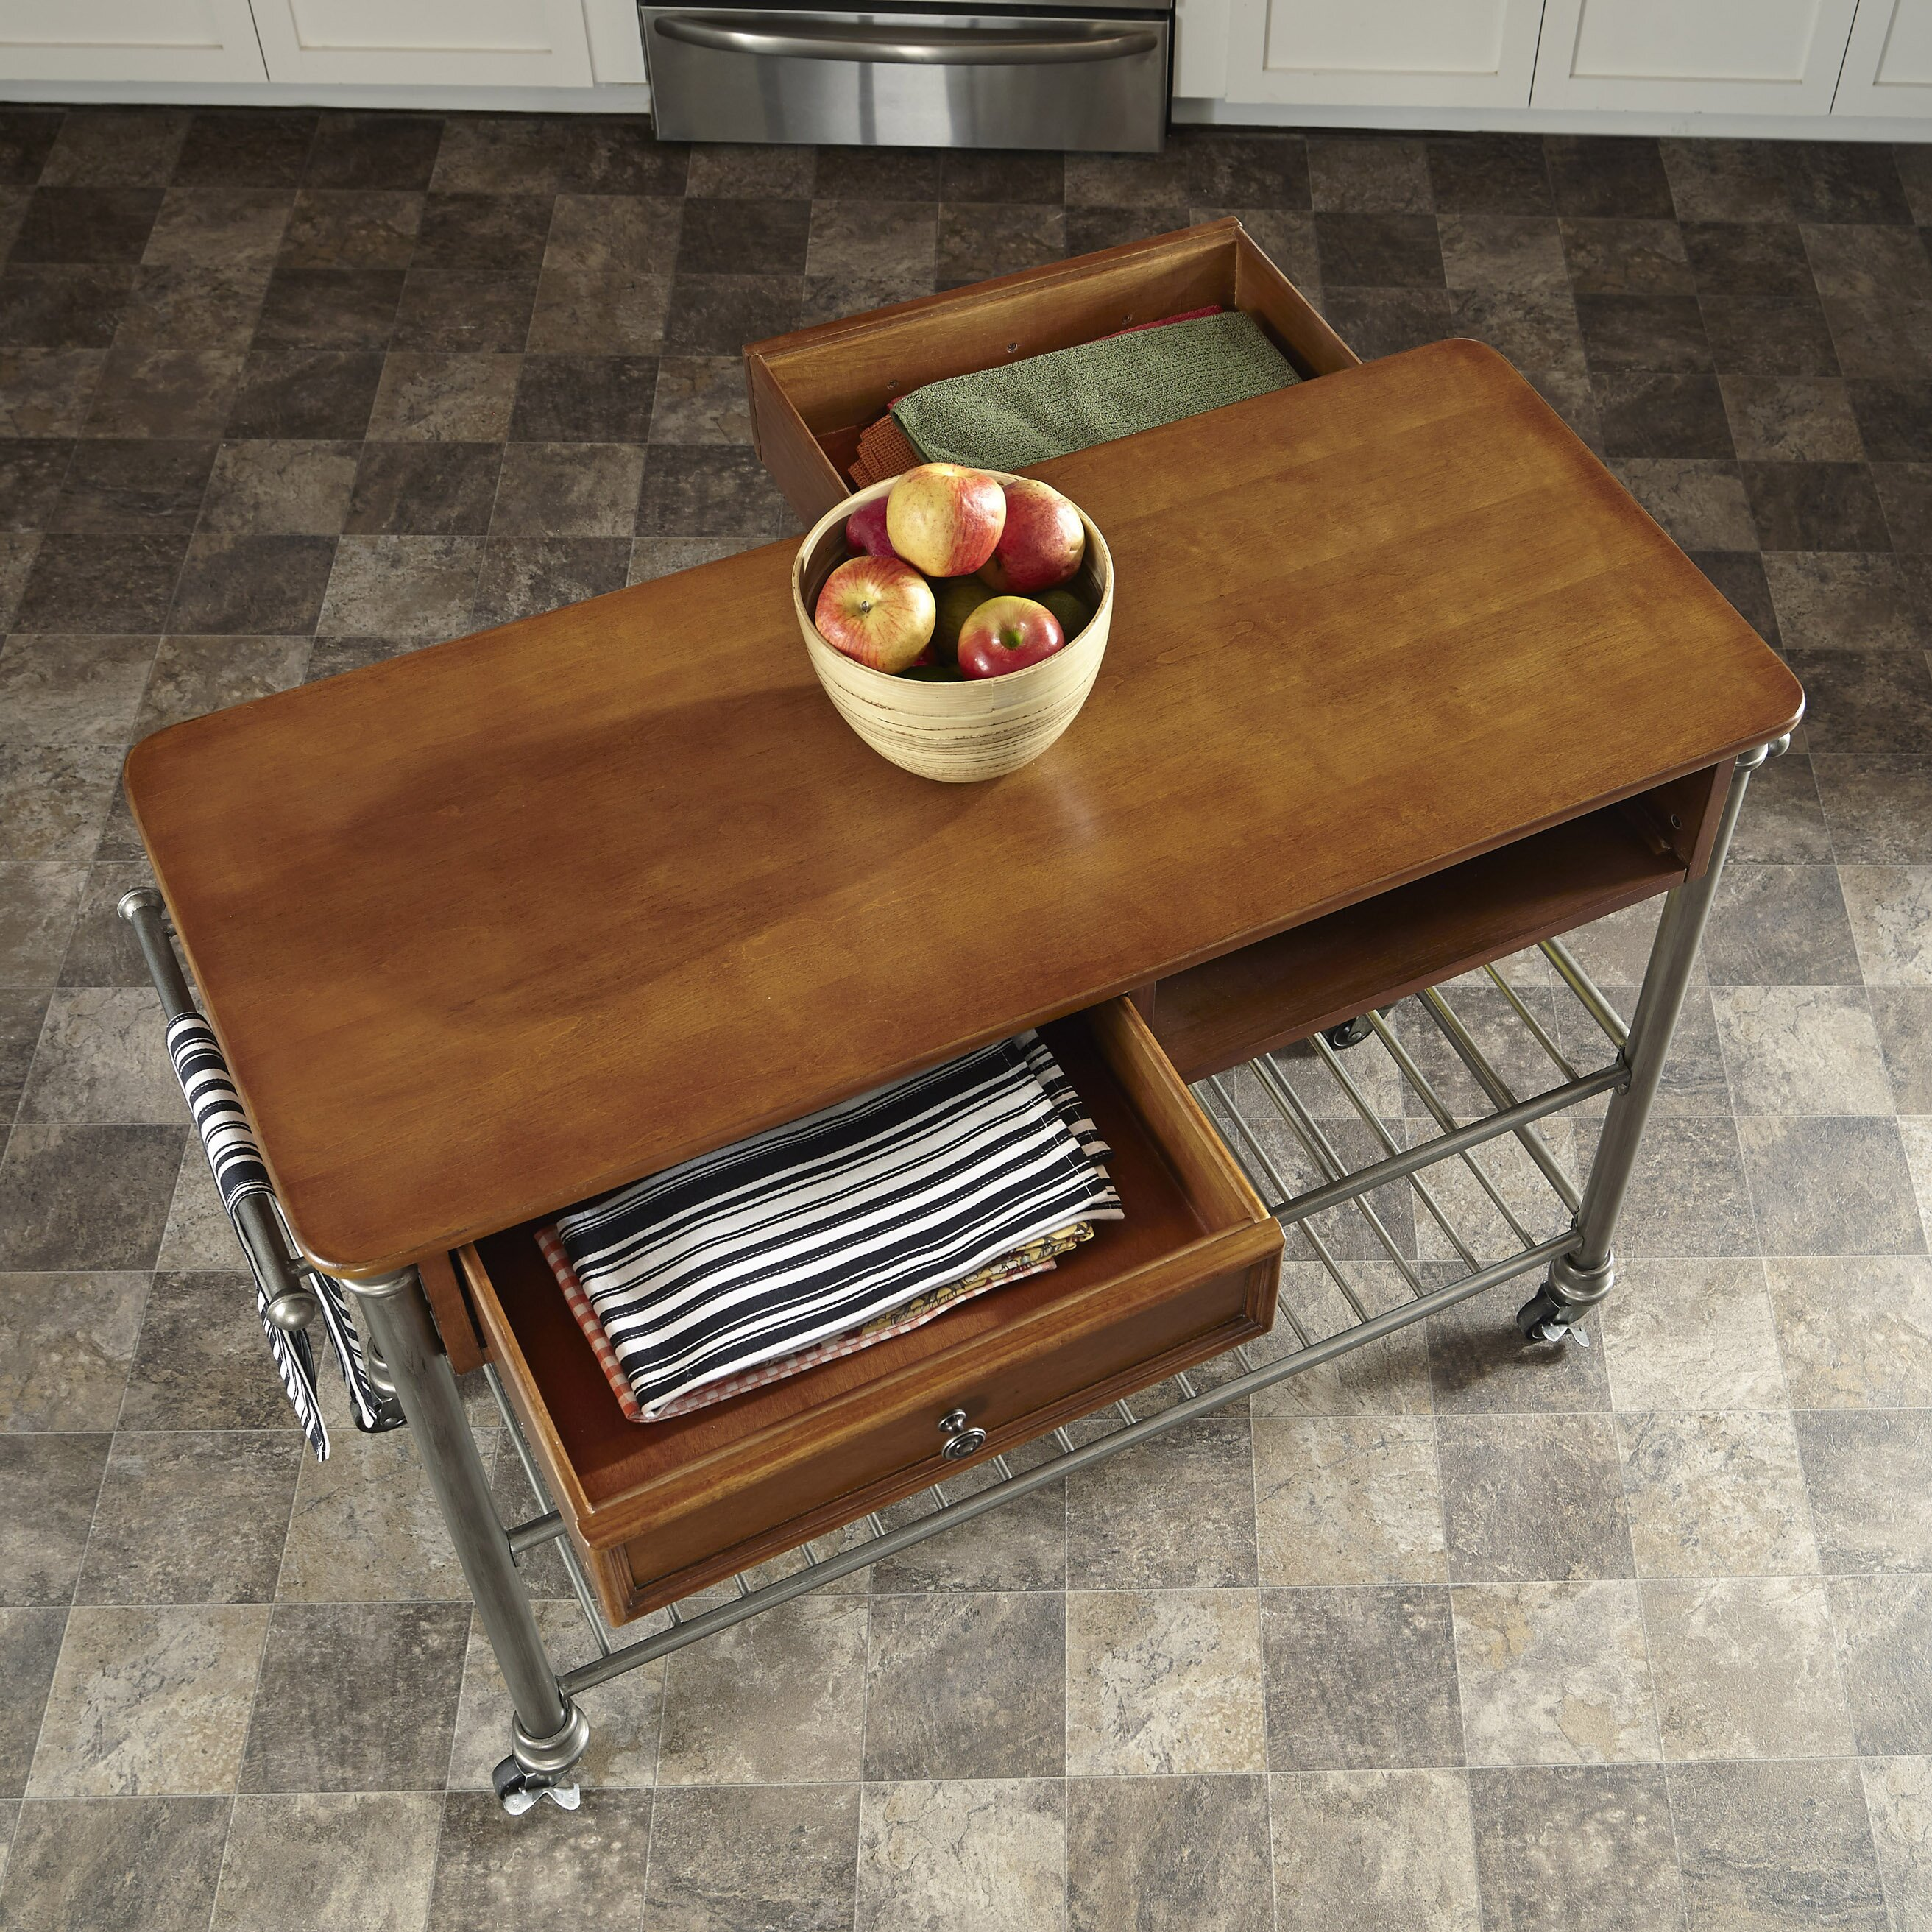 Kitchen Wood Top: Red Barrel Studio Kibbe Kitchen Island With Wood Top